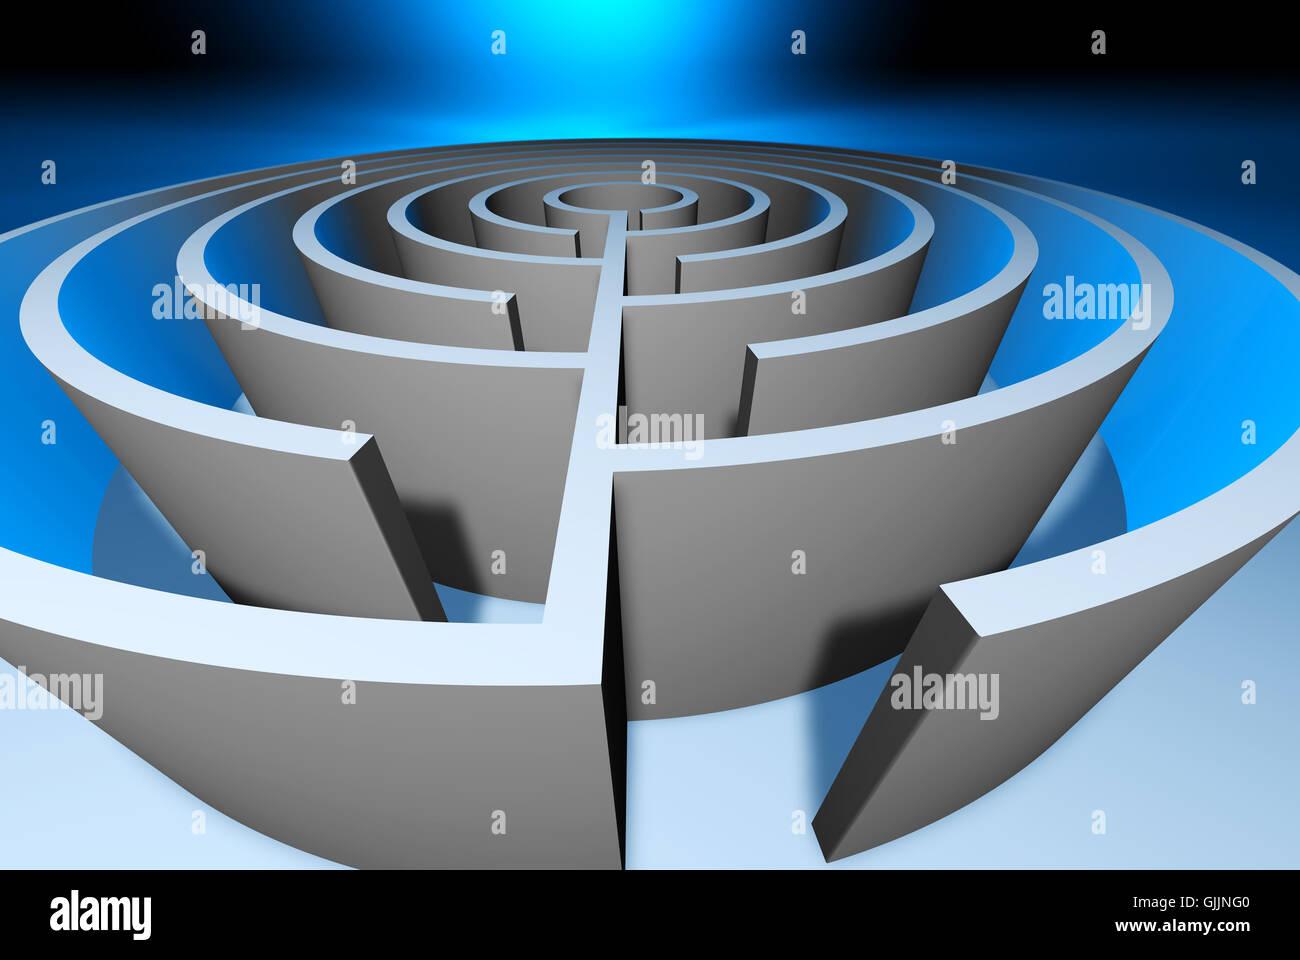 circles a - Stock Image